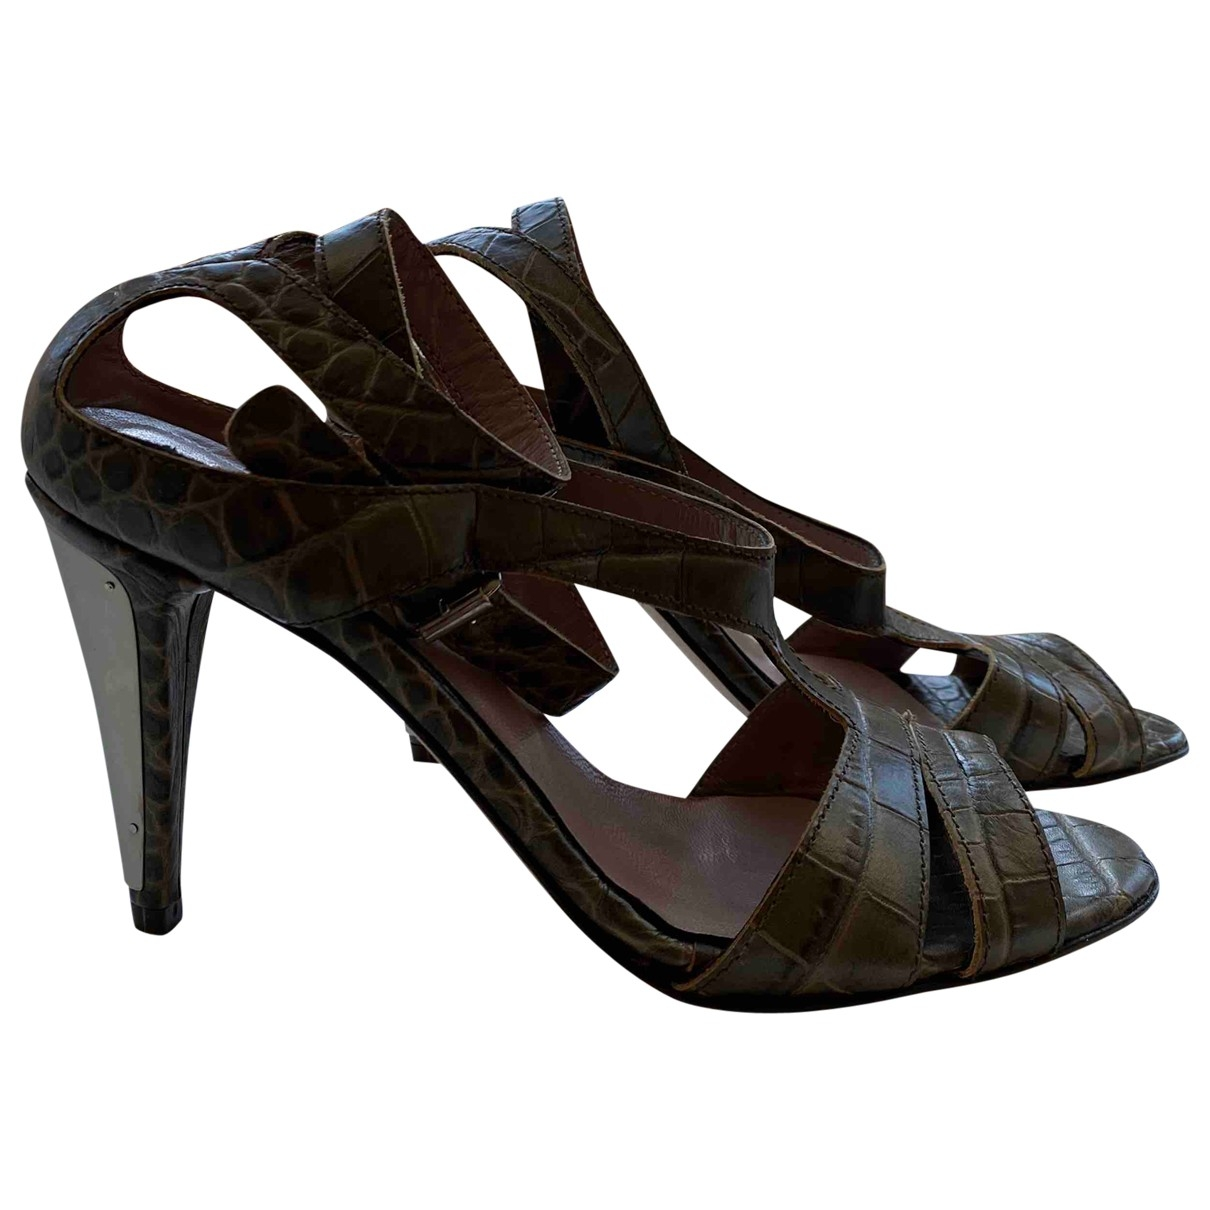 Gianfranco Ferre - Sandales   pour femme en cuir - kaki